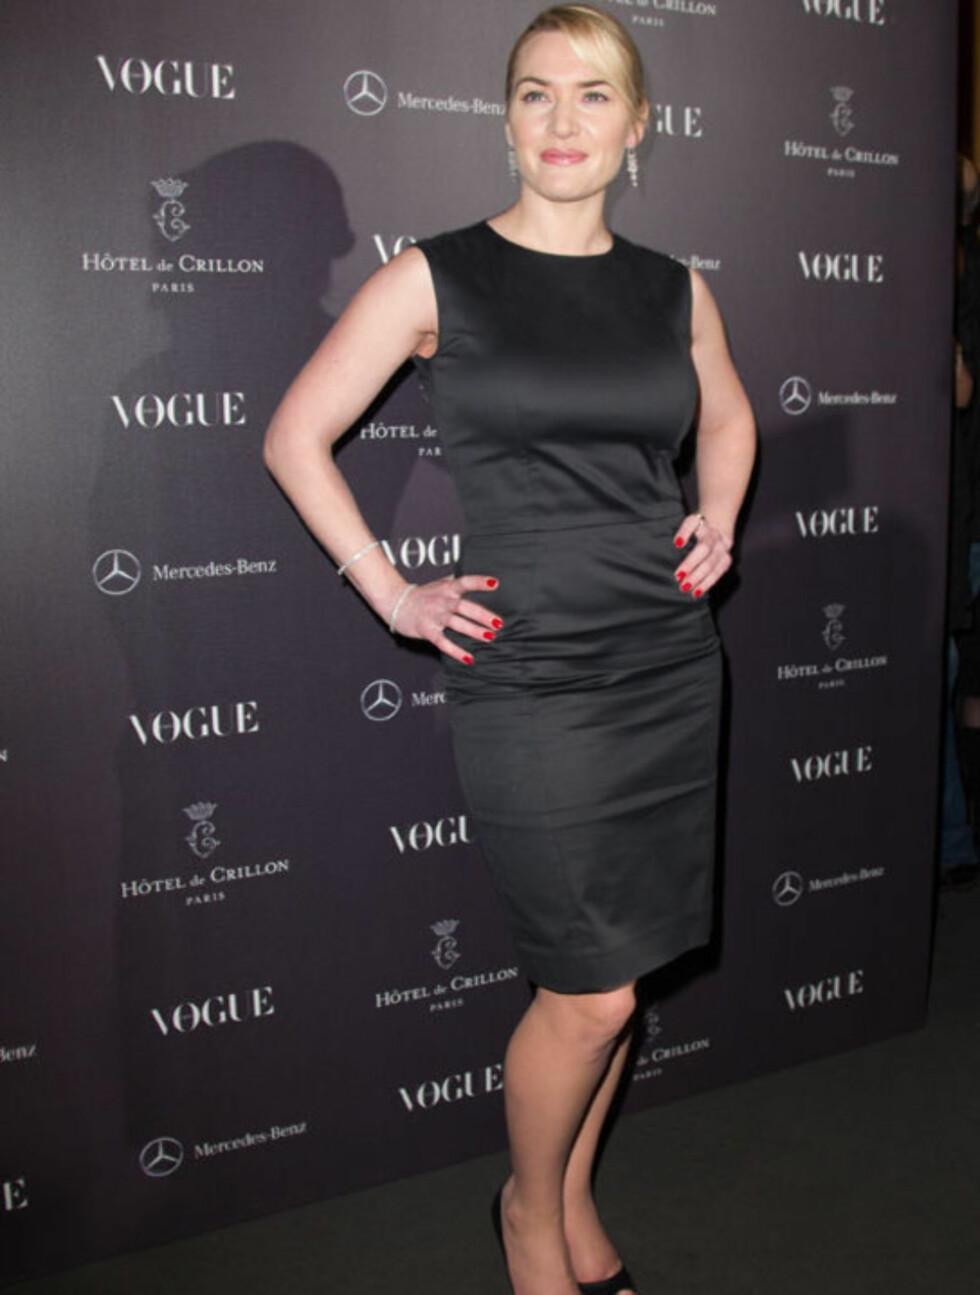 STILSIKKER: Kate Winslet går definitivt for filosofien «less is more» - kun diskrete smykker og røde negler gjør henne elegant til fingerspissene... Her på en Vouge-fest i Paris i mars.  Foto: All Over Press